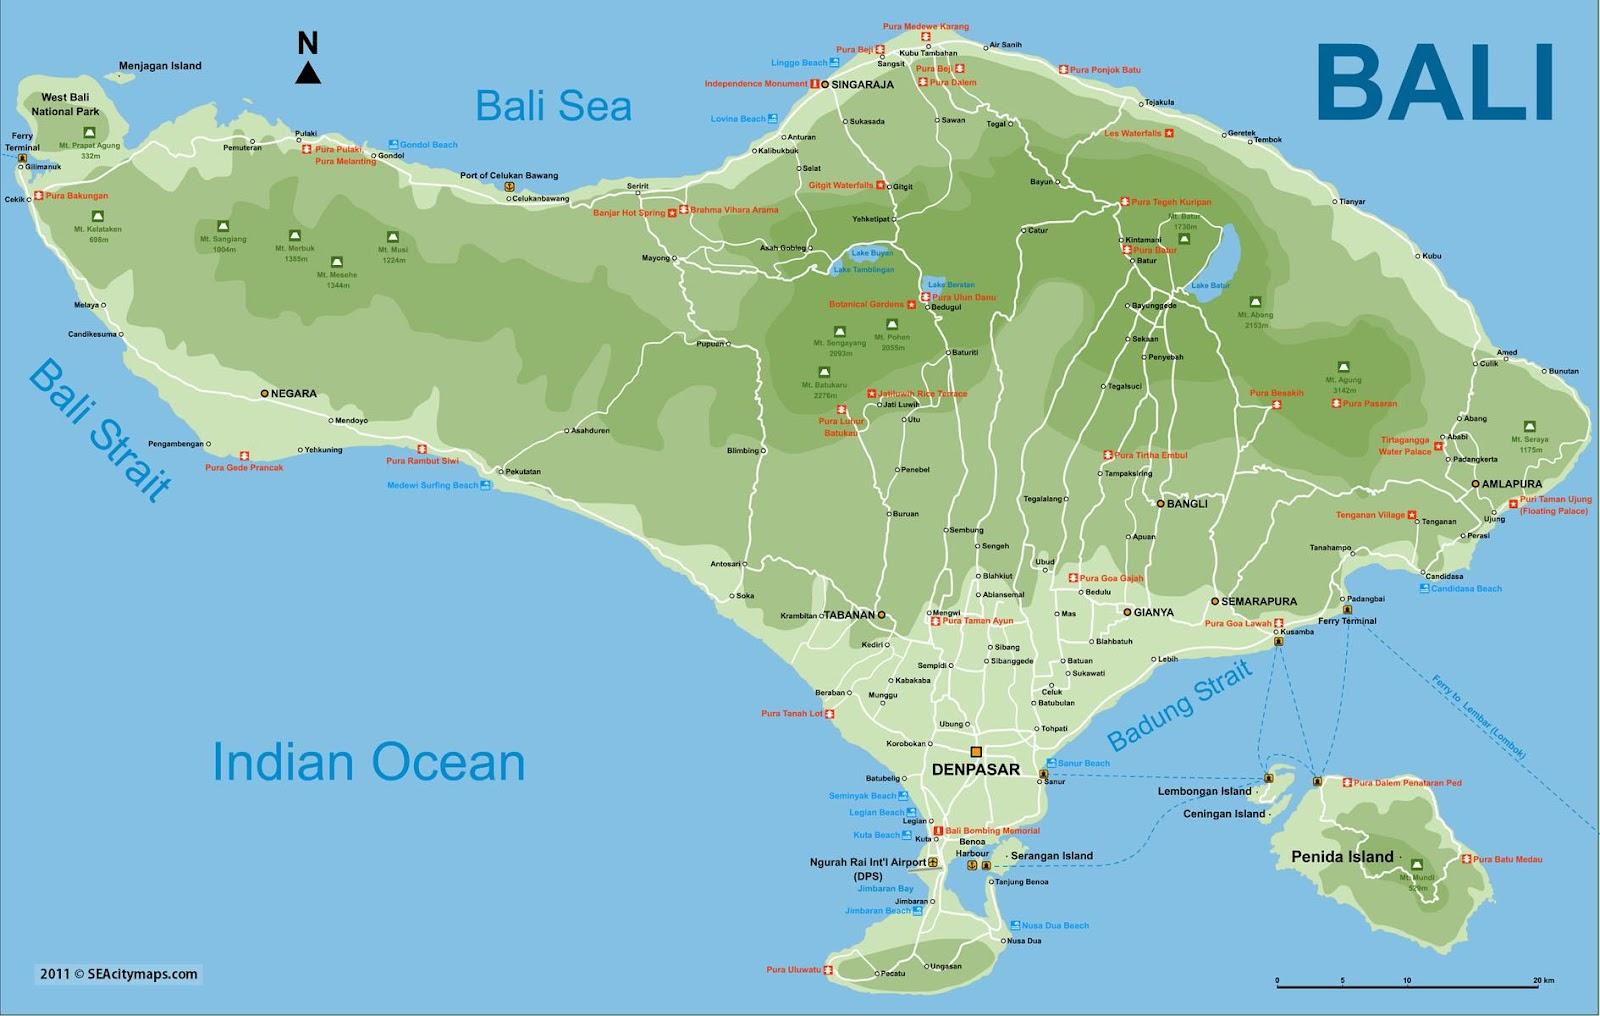 http://tuvillaenbali.com/wp-content/uploads/2013/12/bali_map.jpg